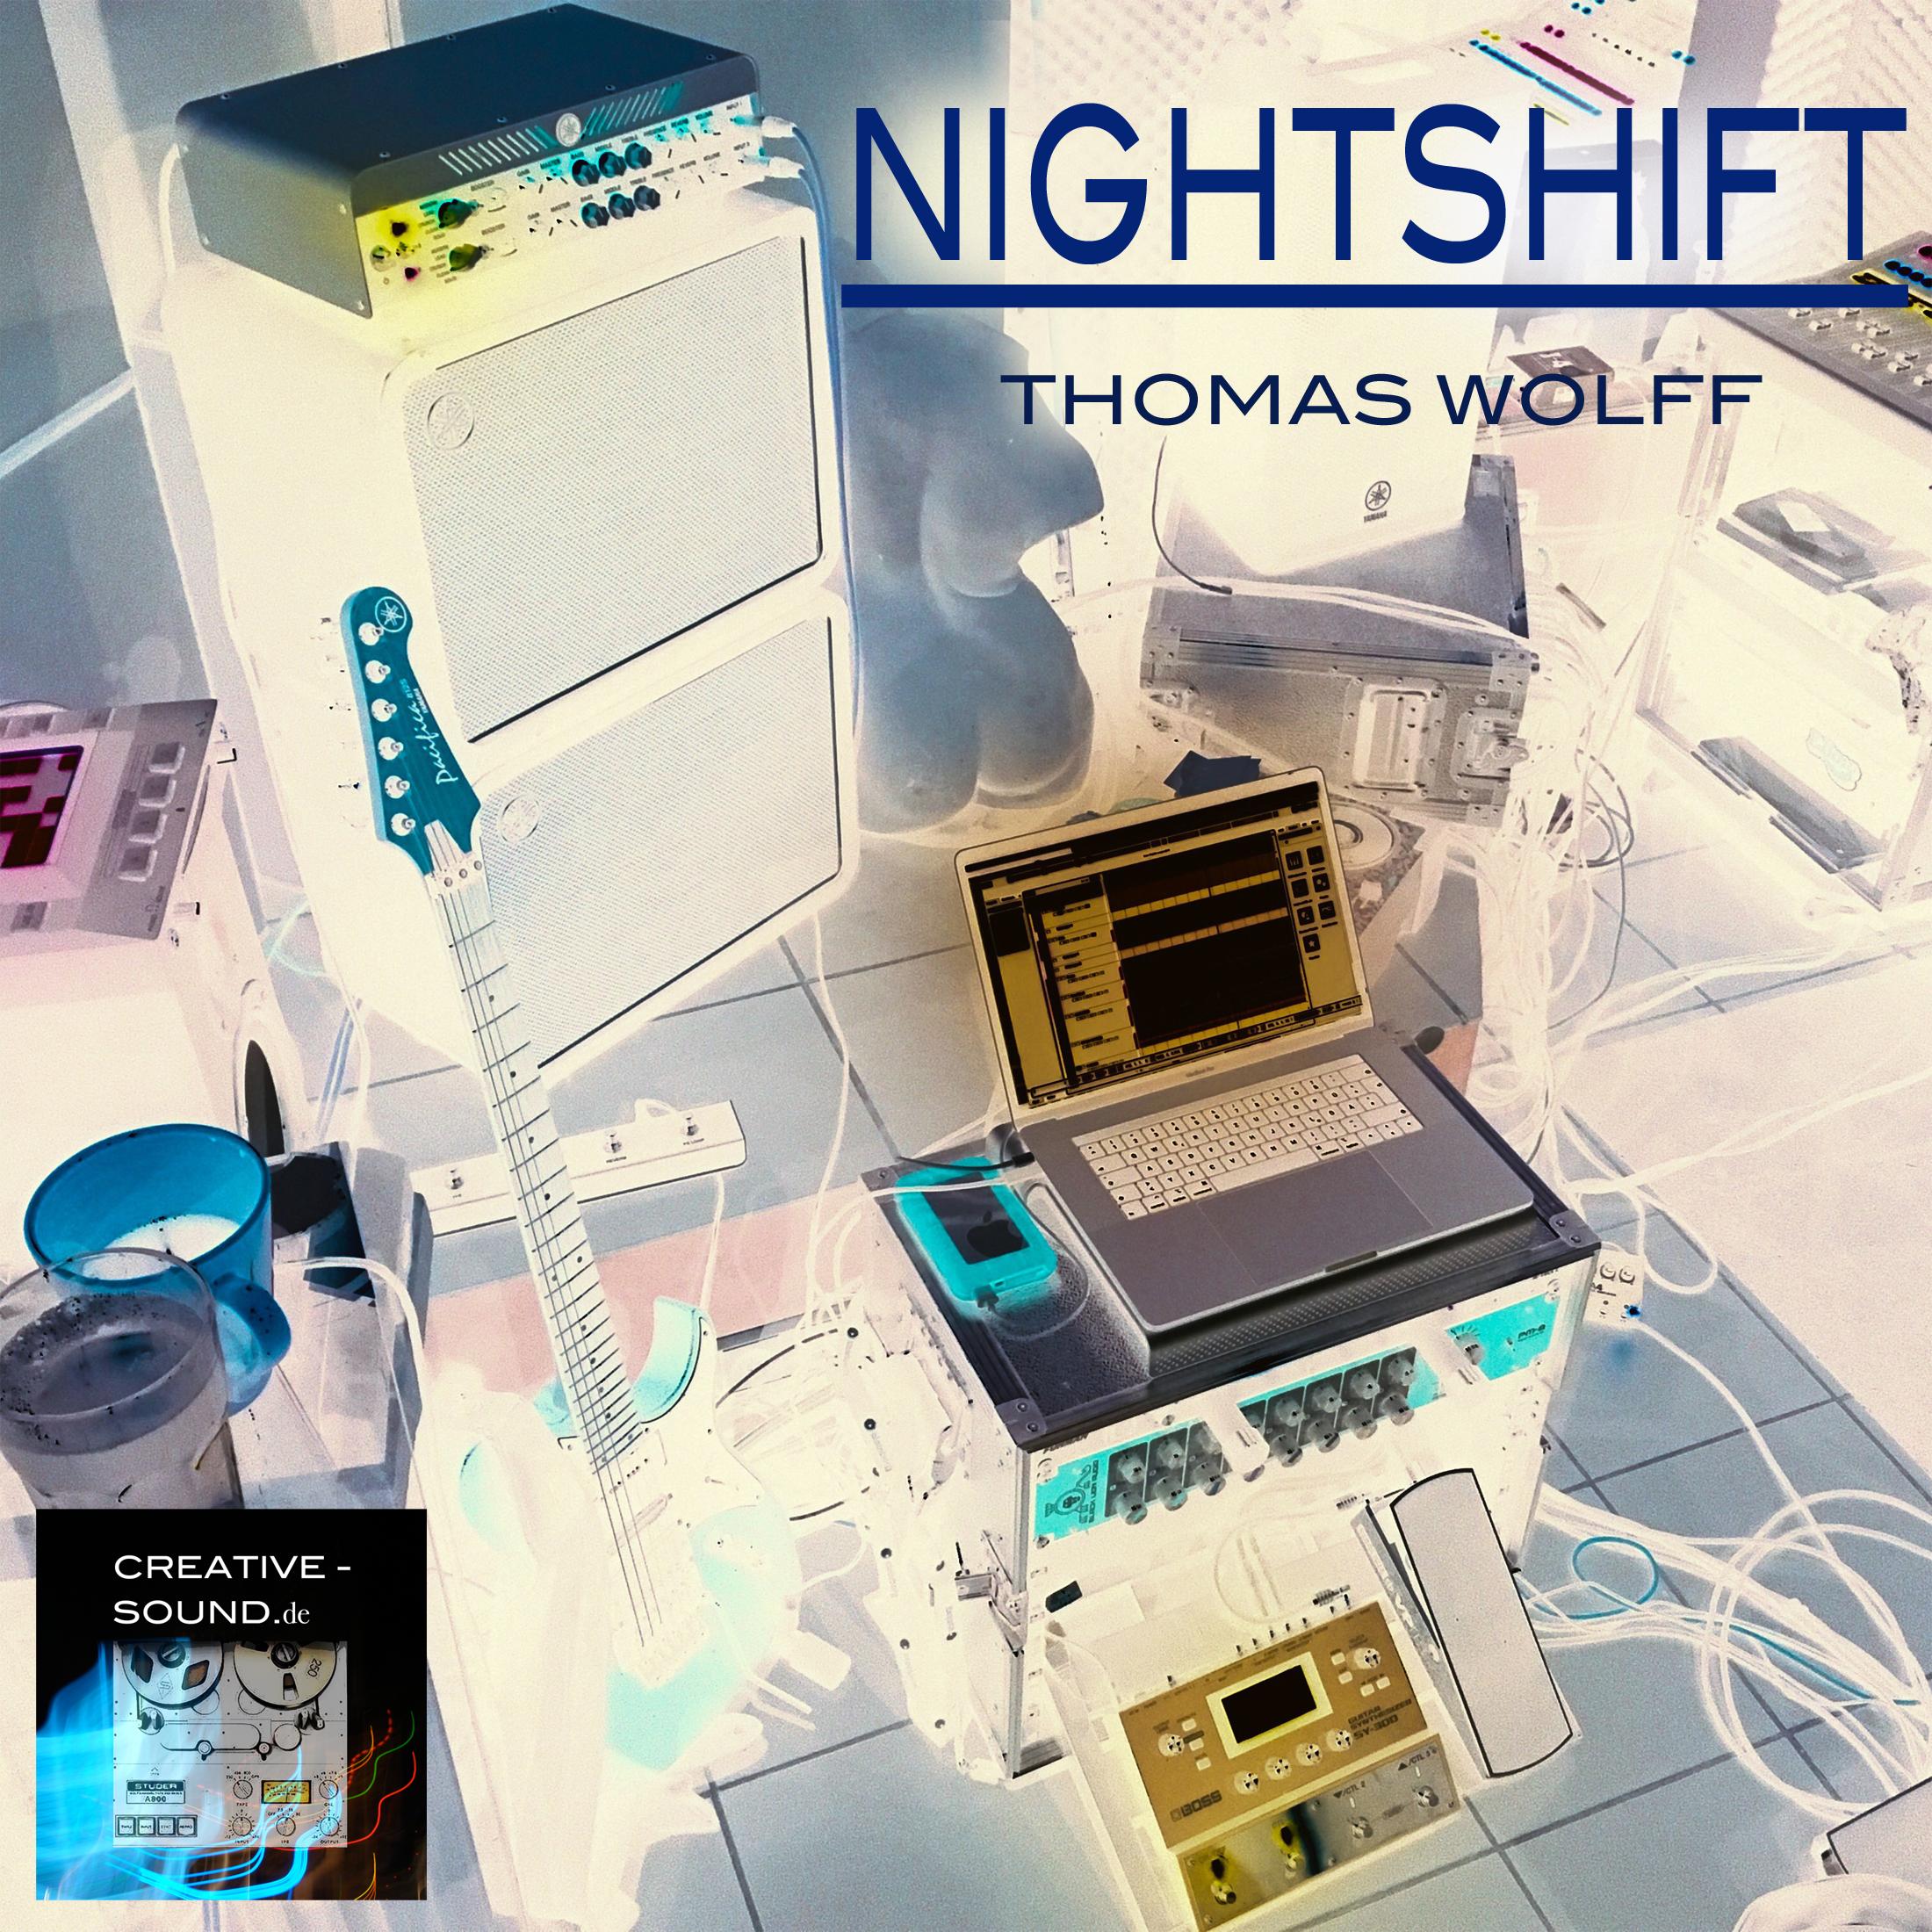 NIGHTSHIFT by Thomas Wolff - Album